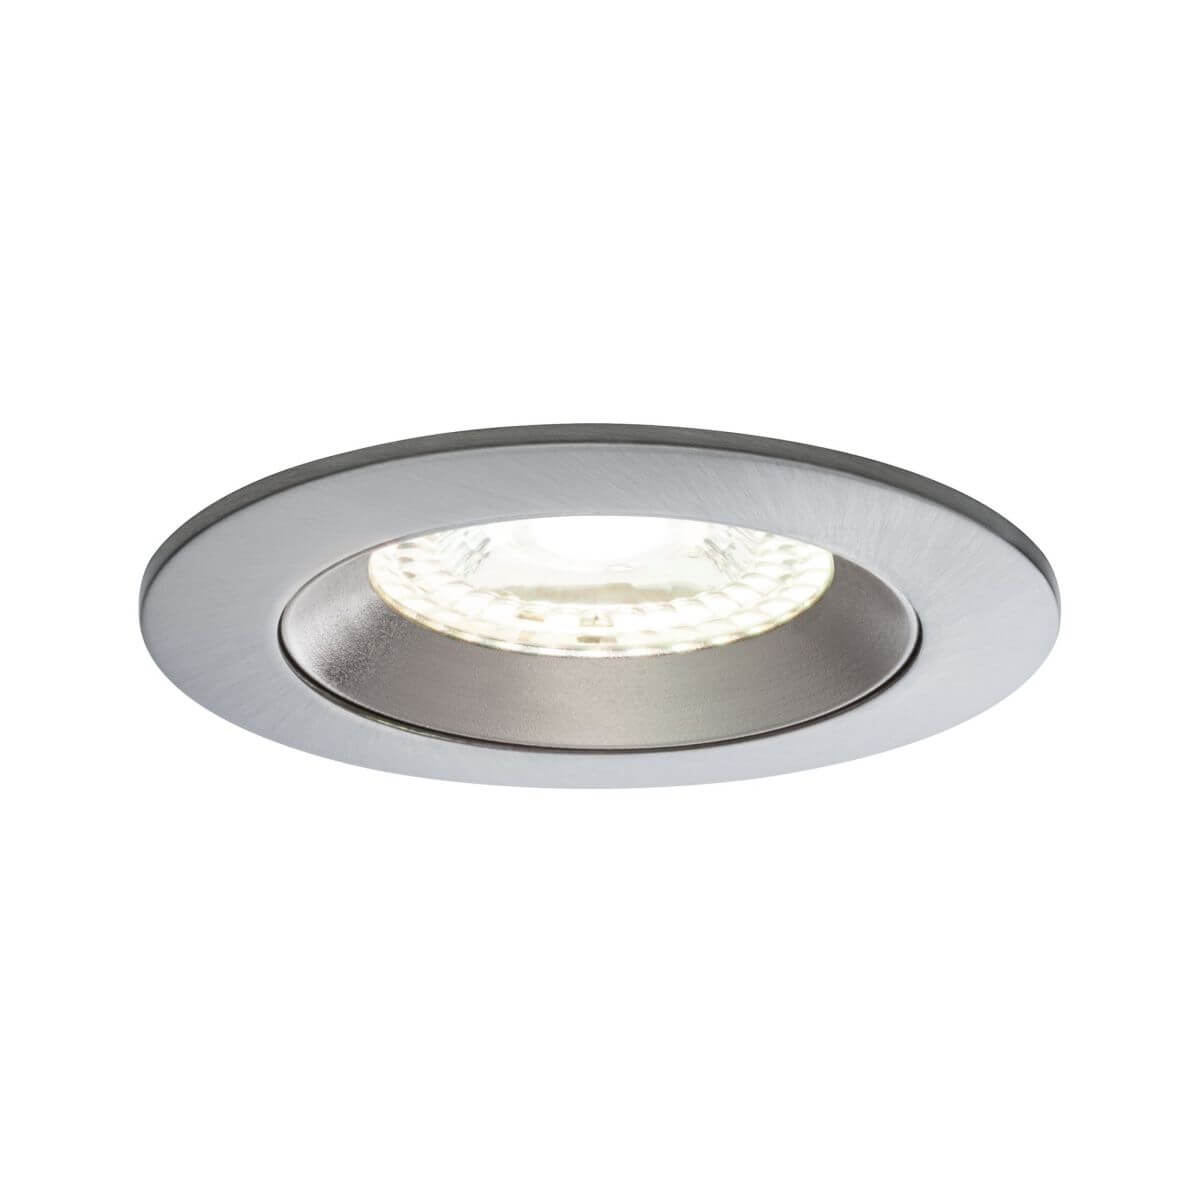 Paulmann SmartHome ZigBee Einbauleuchten-Set LED Lens 3 x 4,8 W, starr